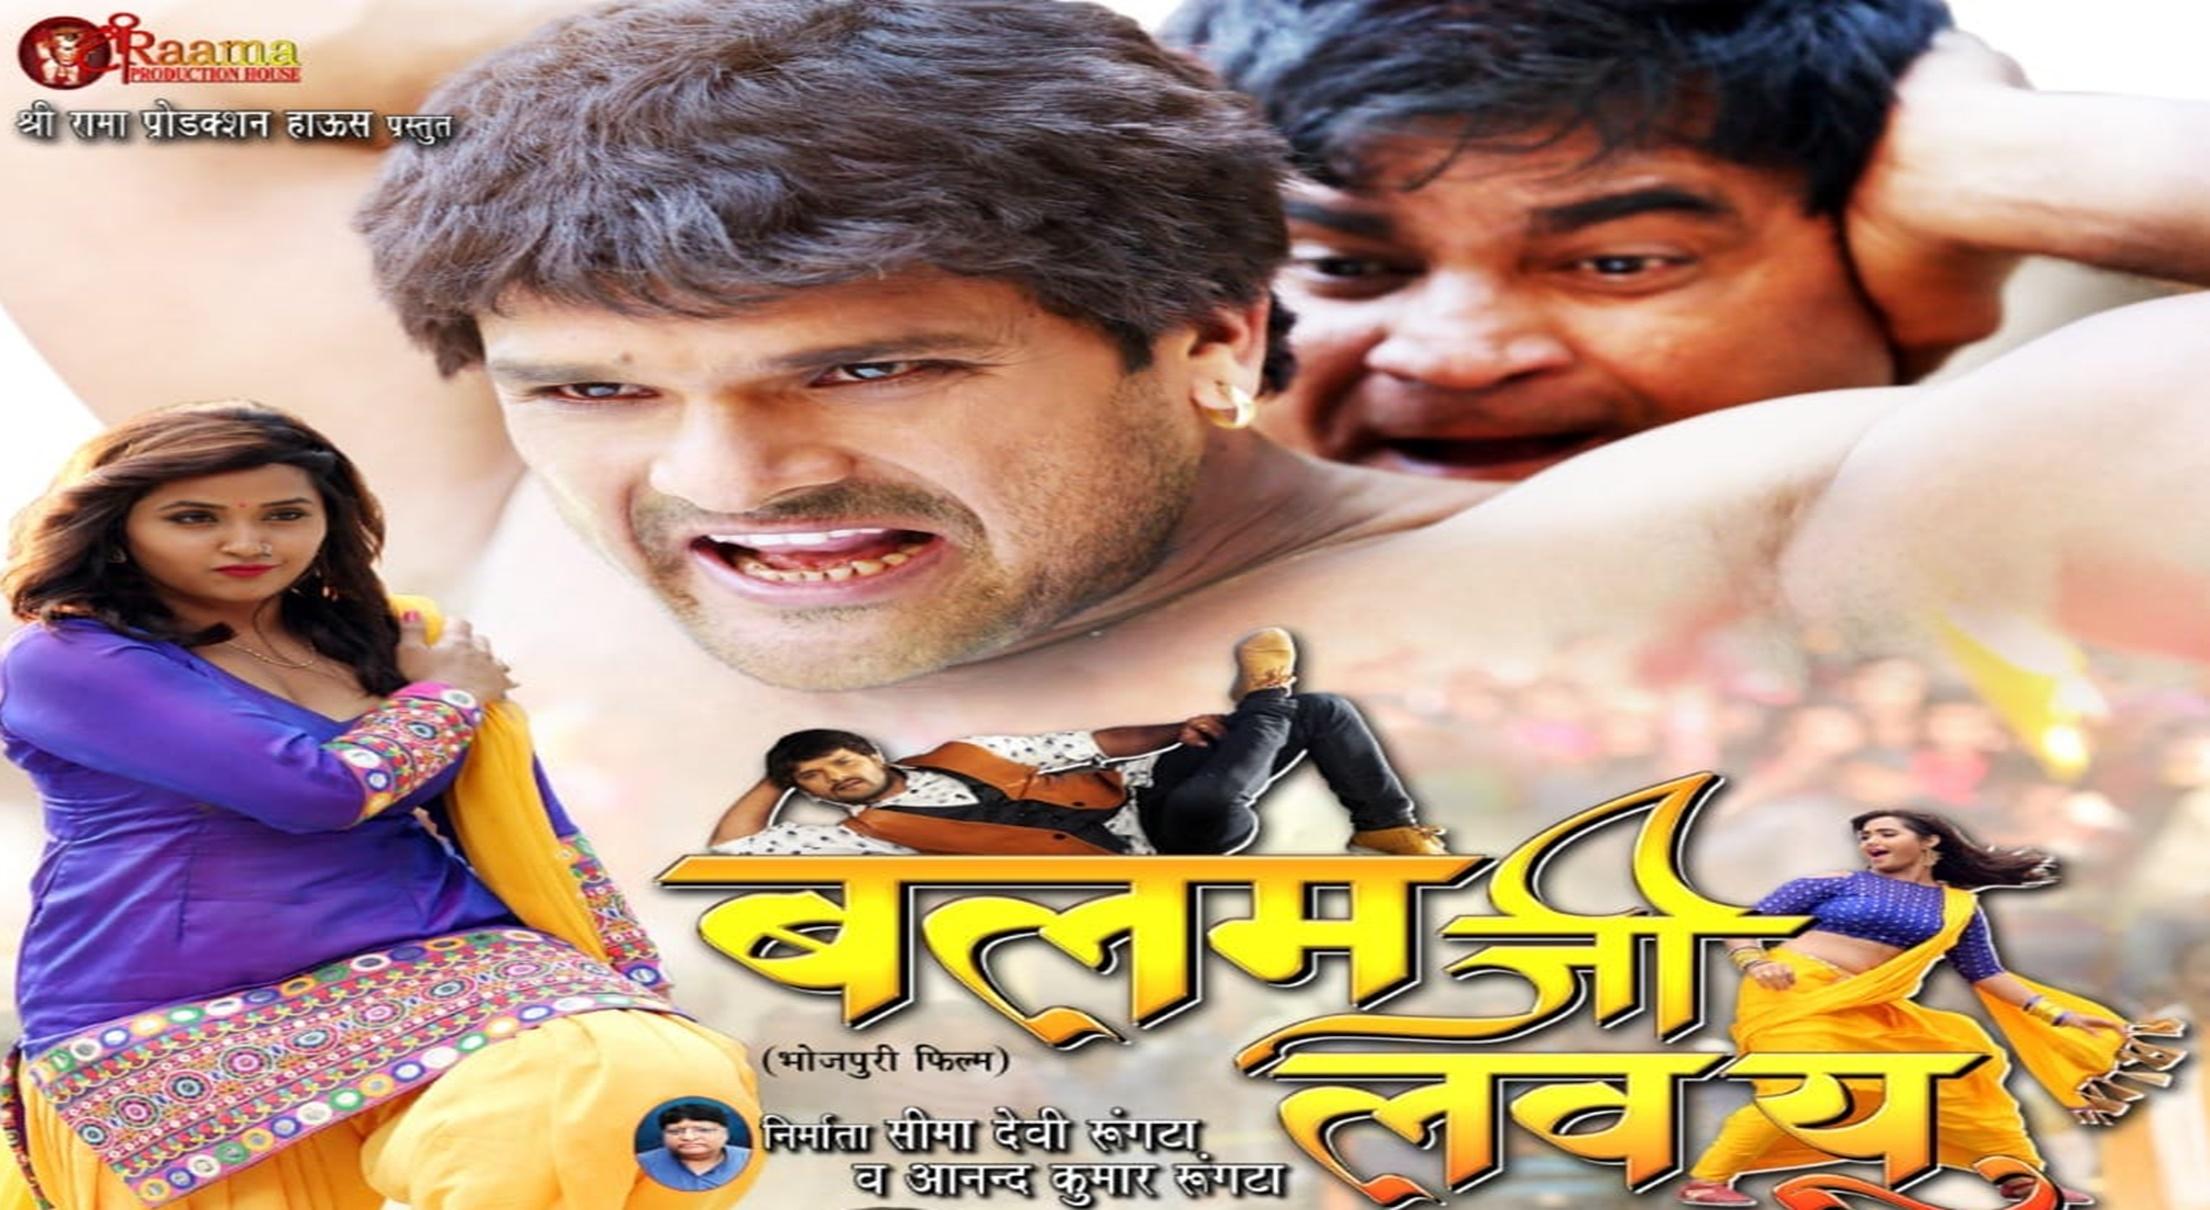 Bollywood actor Ashok Samartha will be accompanied by Khesarilal Yadav